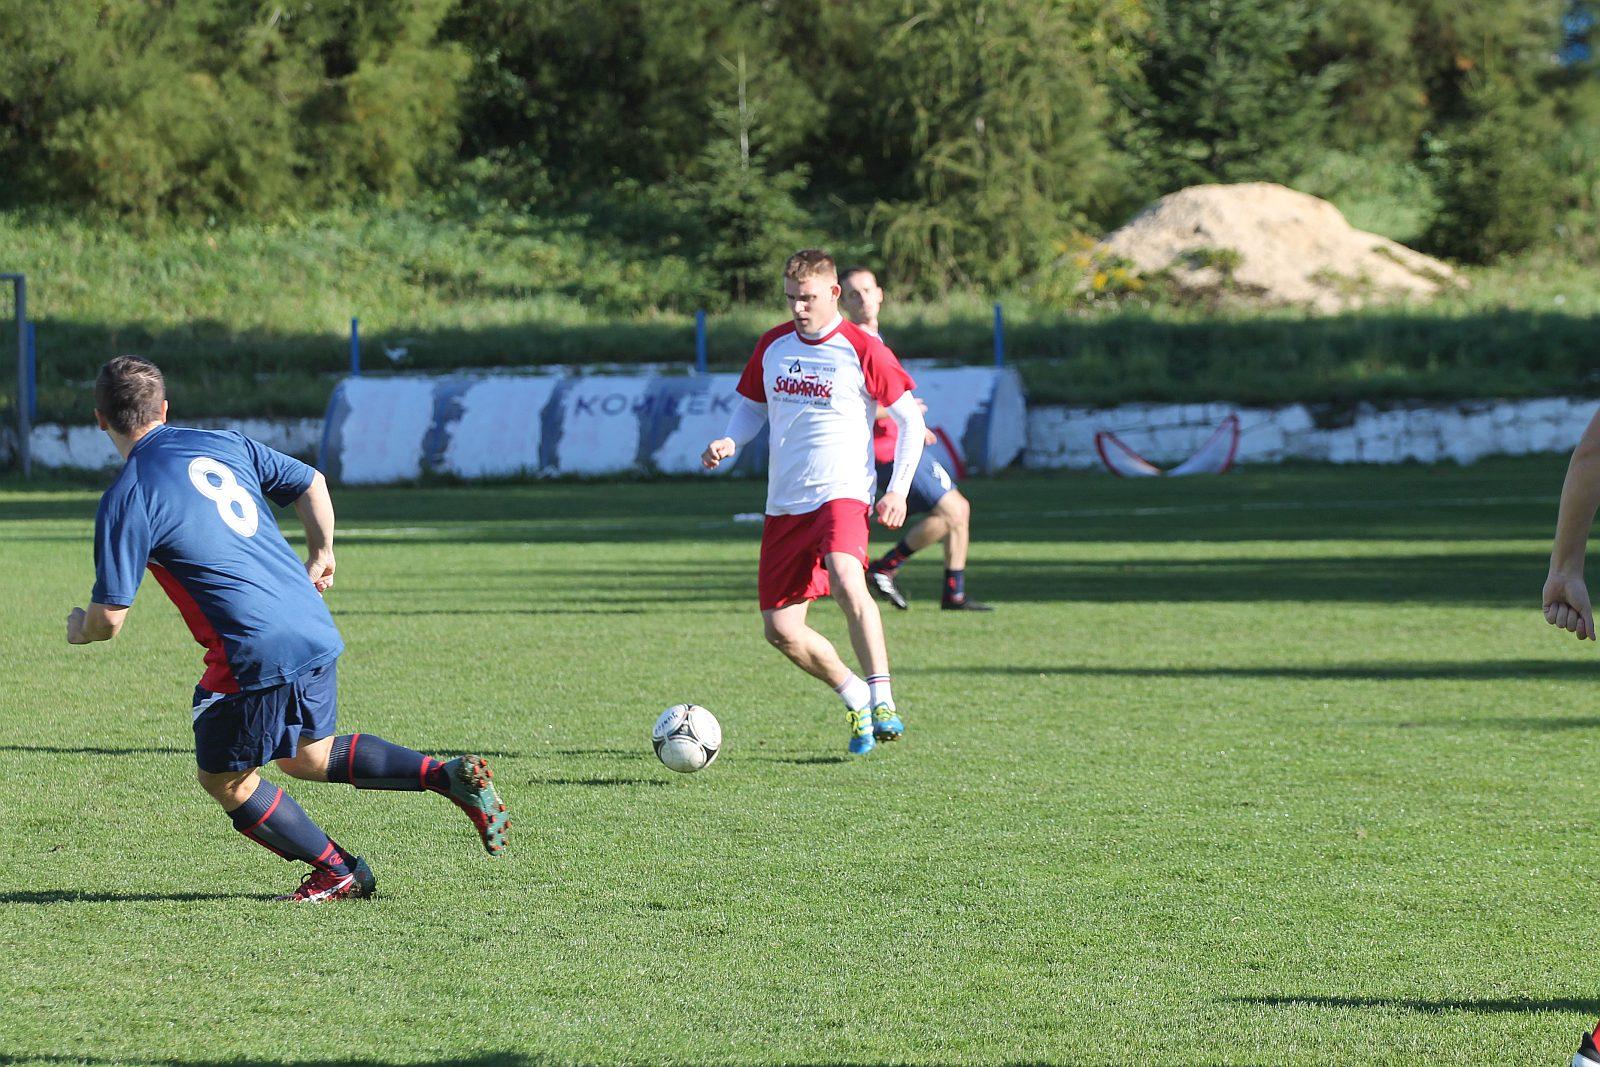 turniej piłkarski (5)